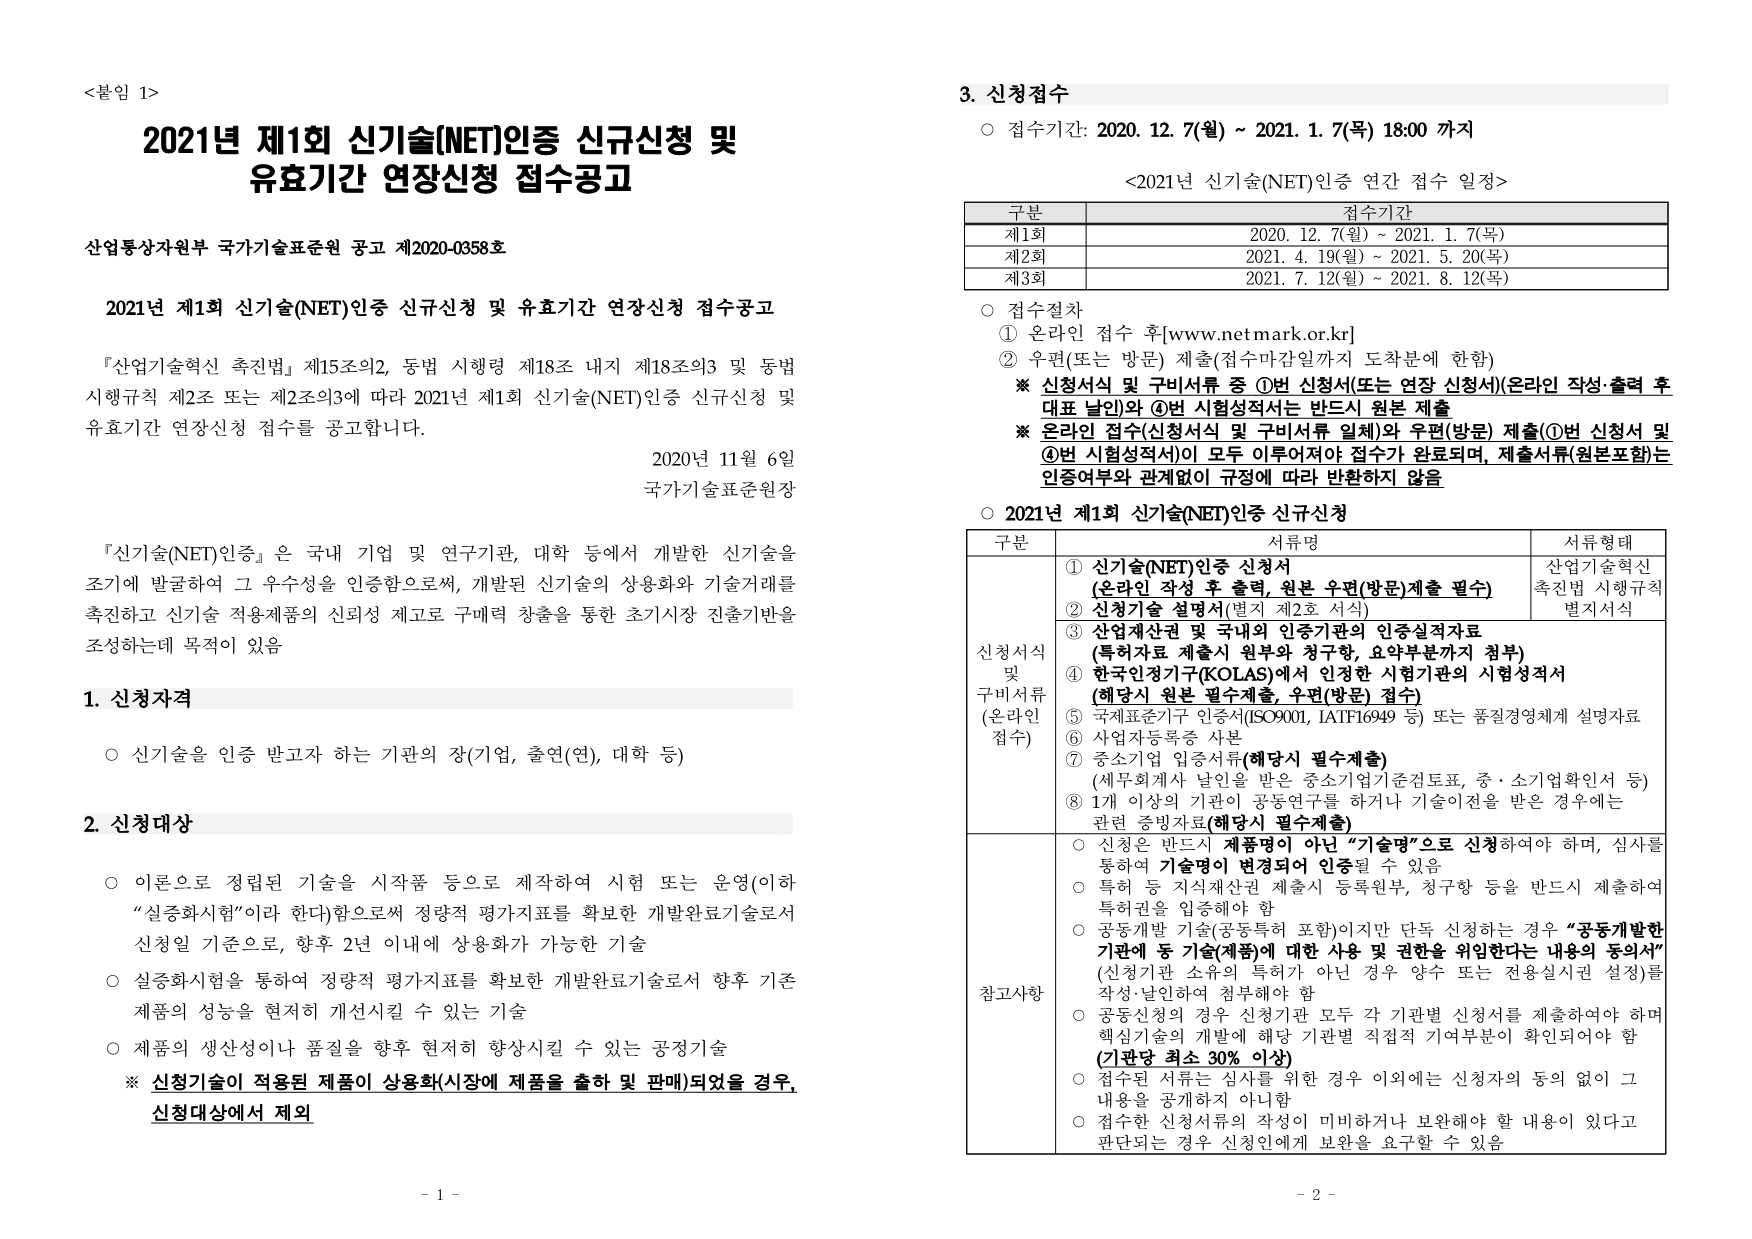 ac3331bd-db7f-40d7-be6a-0201bcc2e82e.pdf-0001.jpg